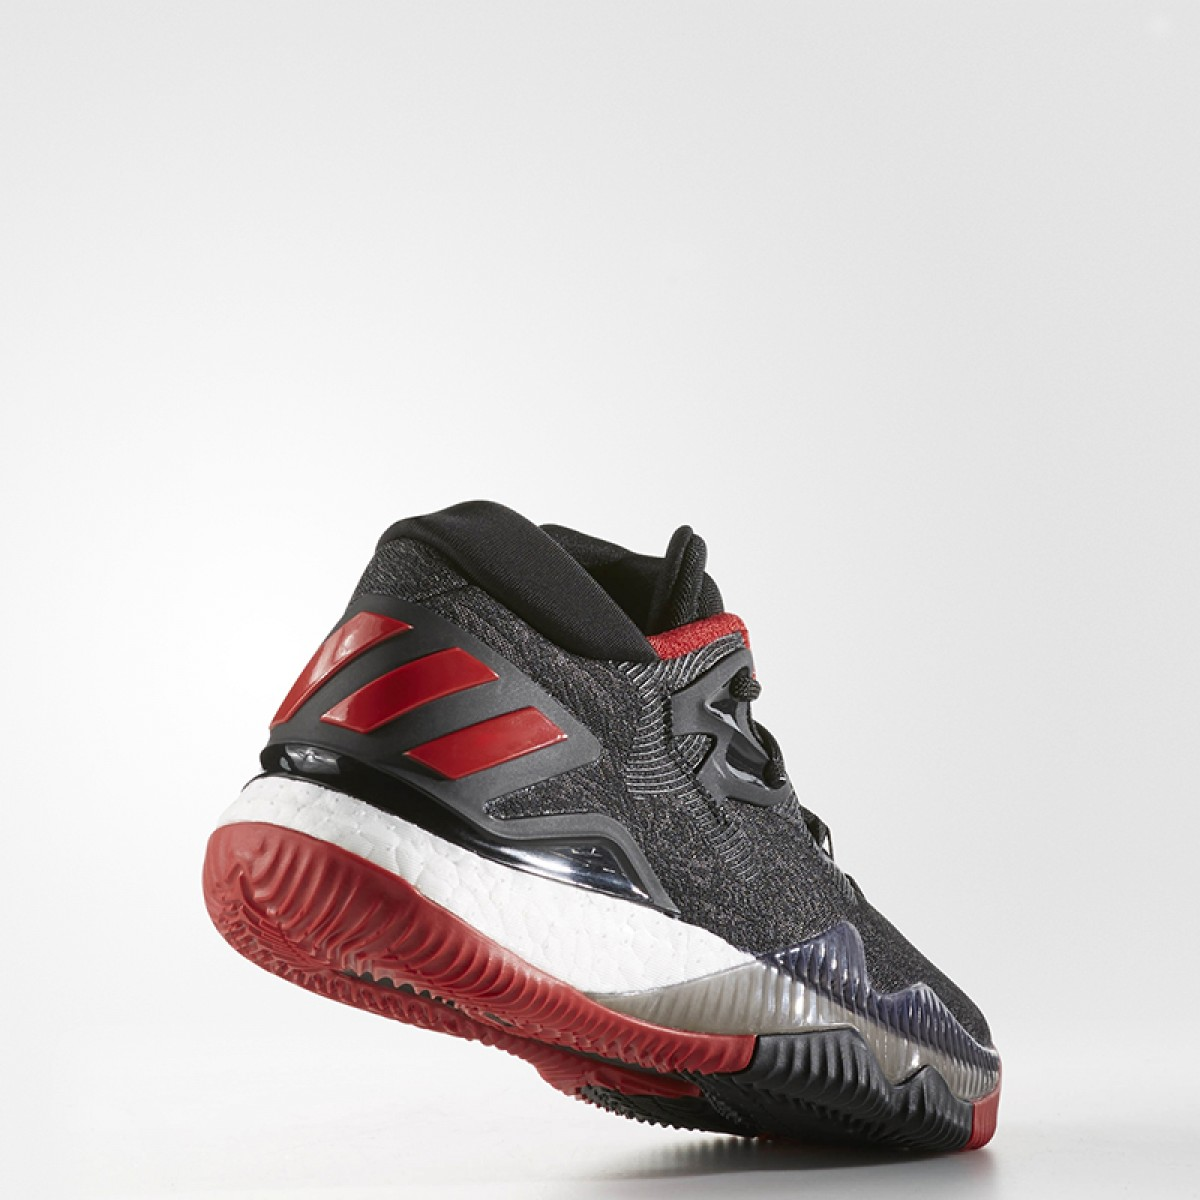 Adidas Crazy Light Boost Low 2016 Jr 'Black Scarlet' B42603